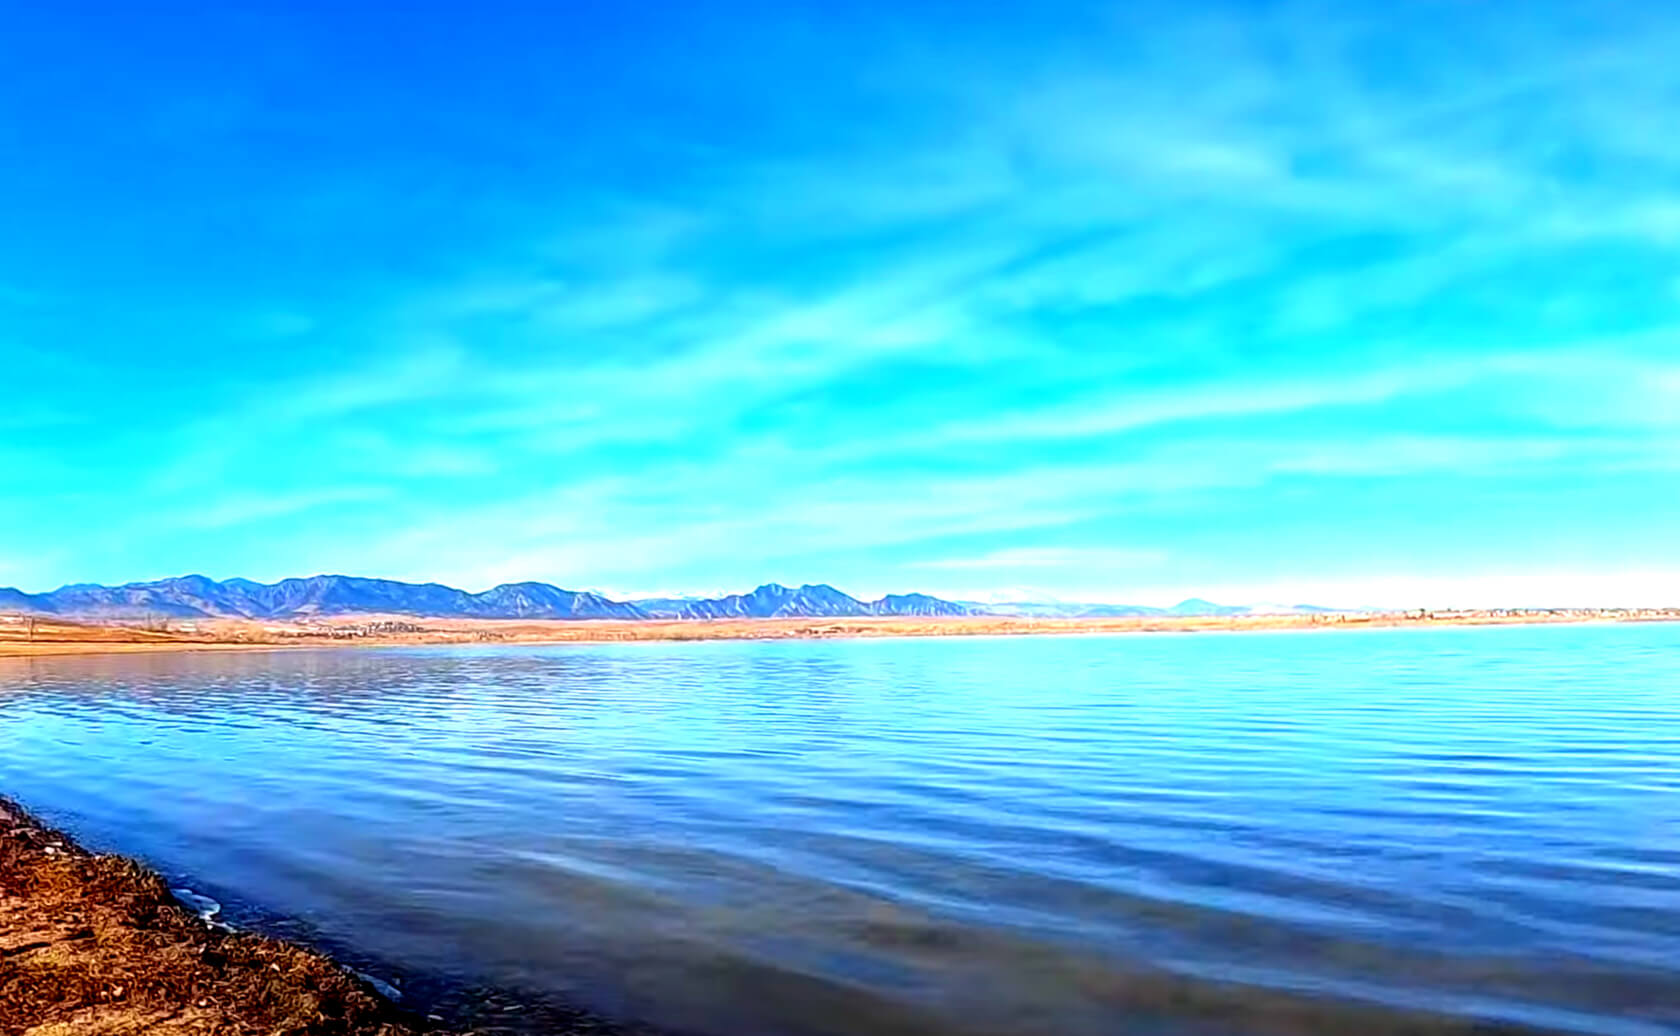 Standley-Lake-Fishing-Guide-Report-Colorado-03